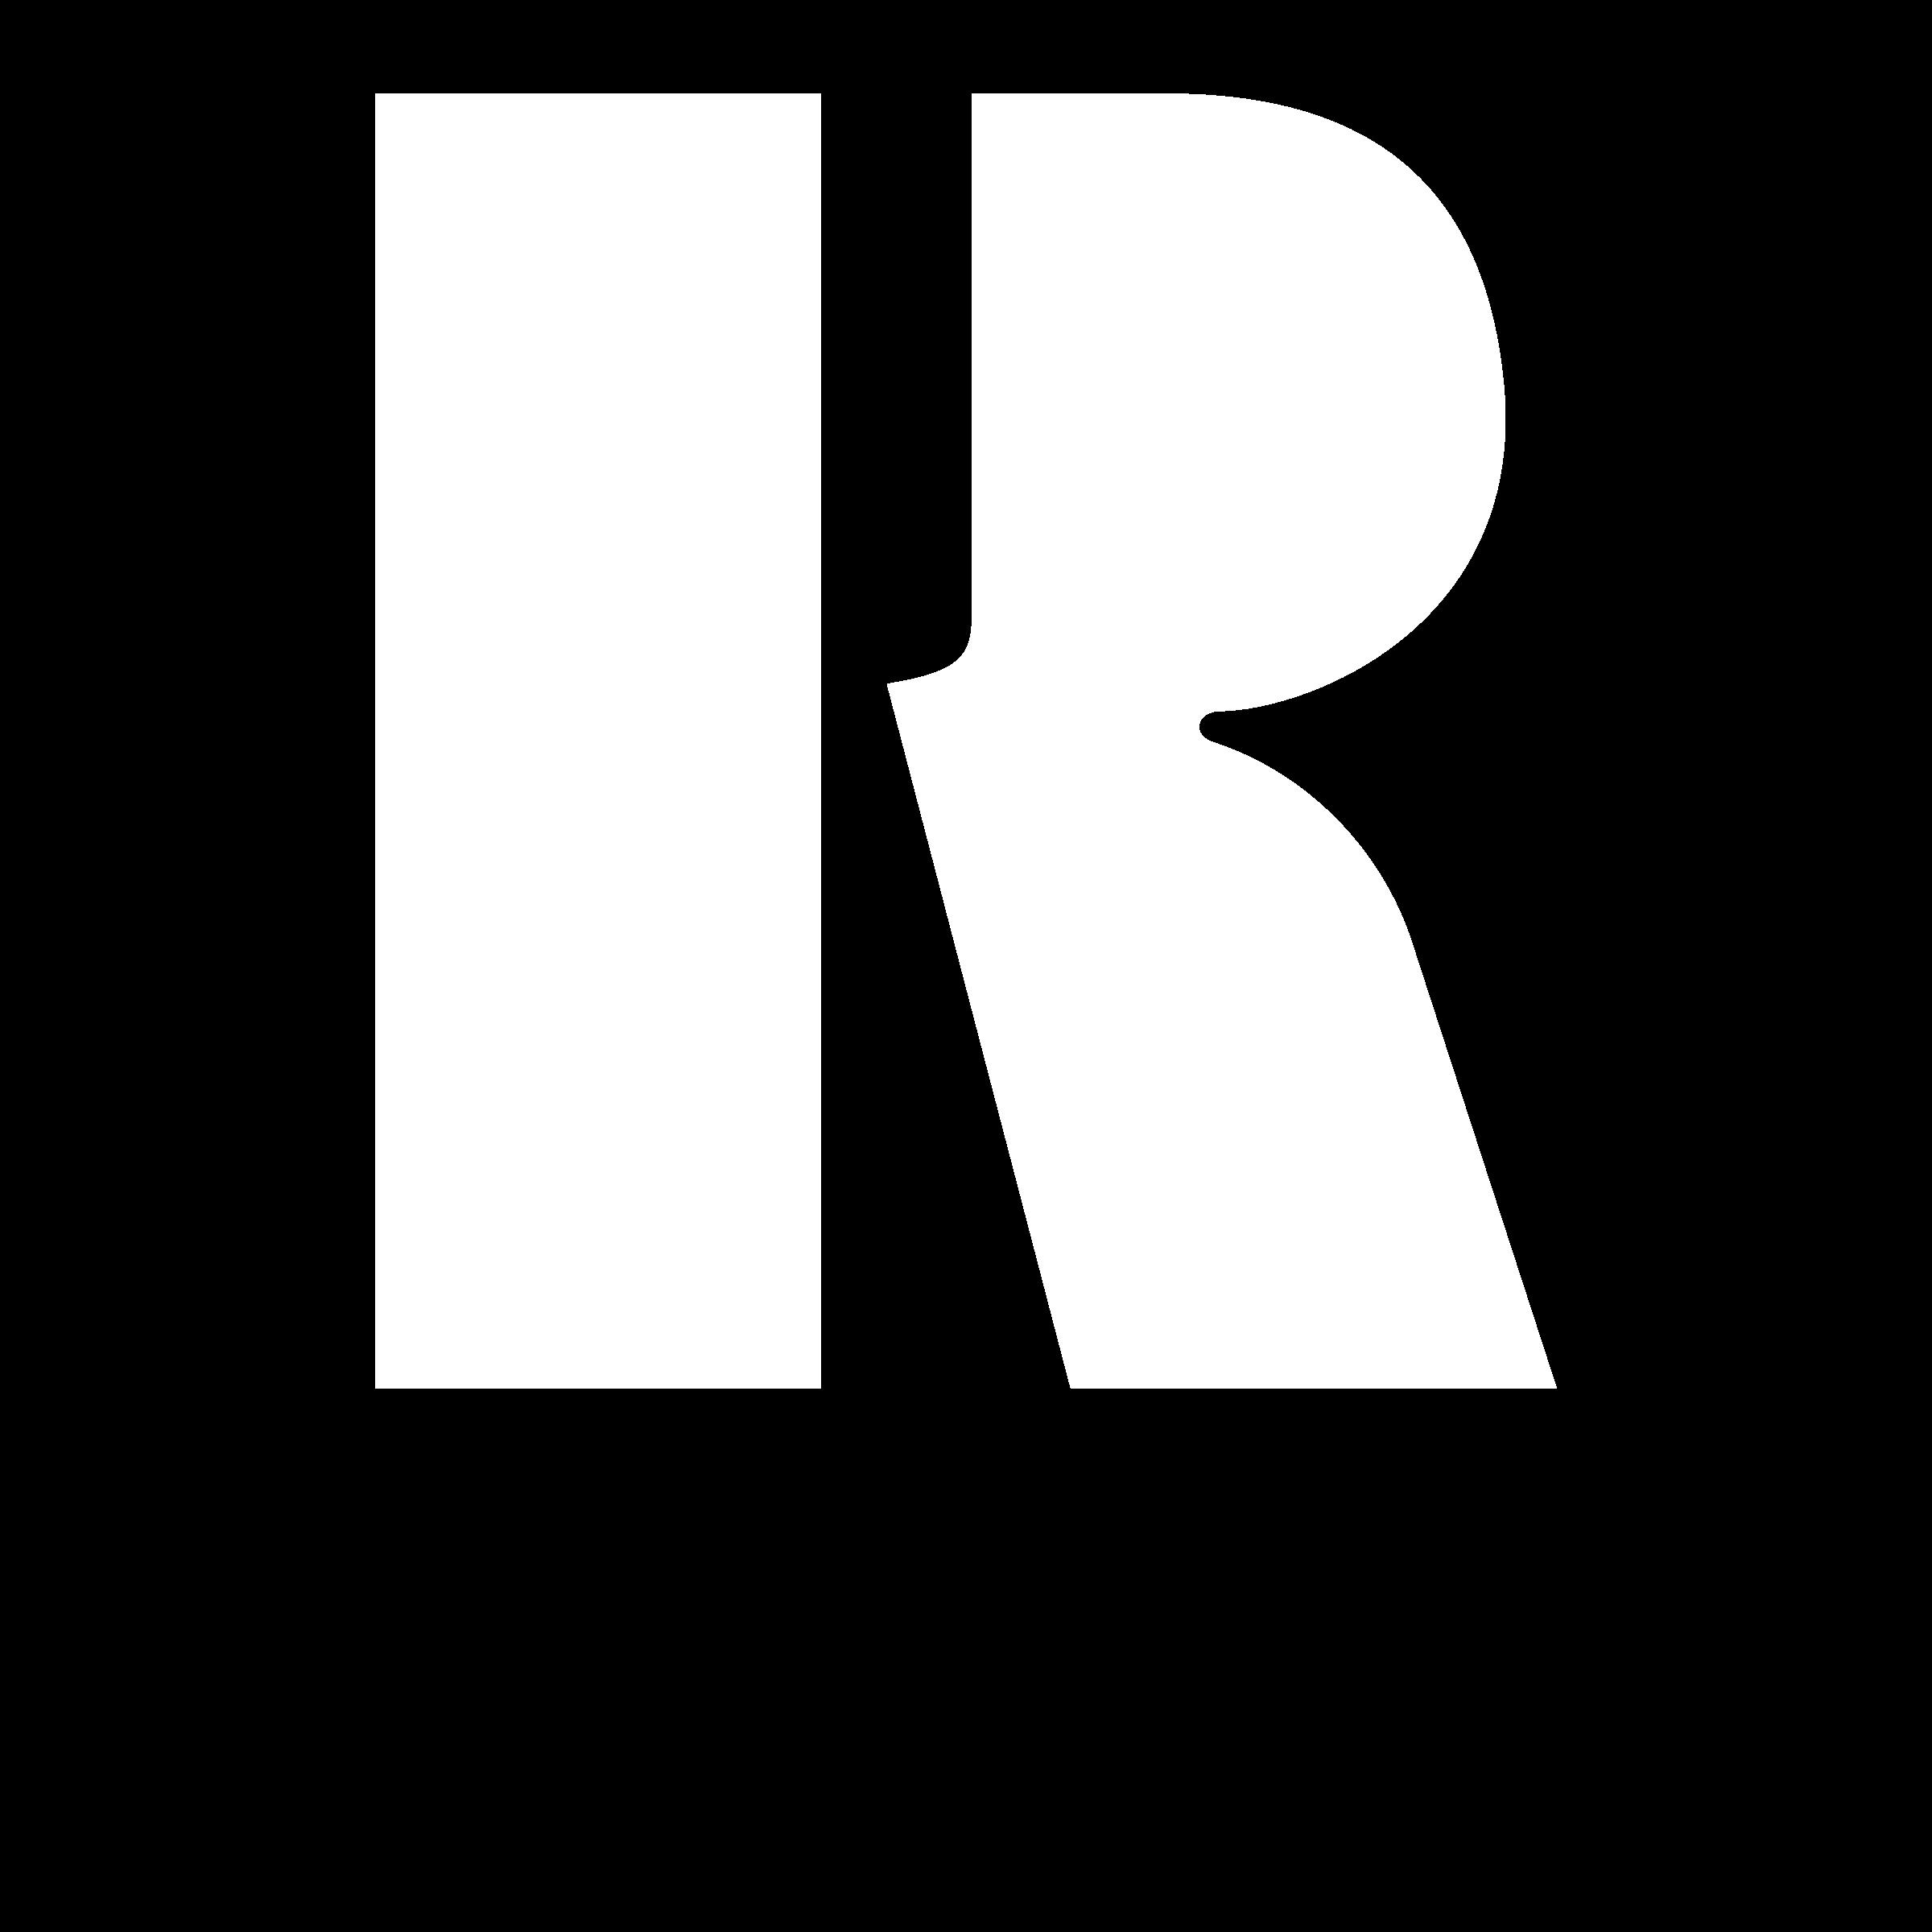 Ricoh Logo PNG Transparent & SVG Vector.